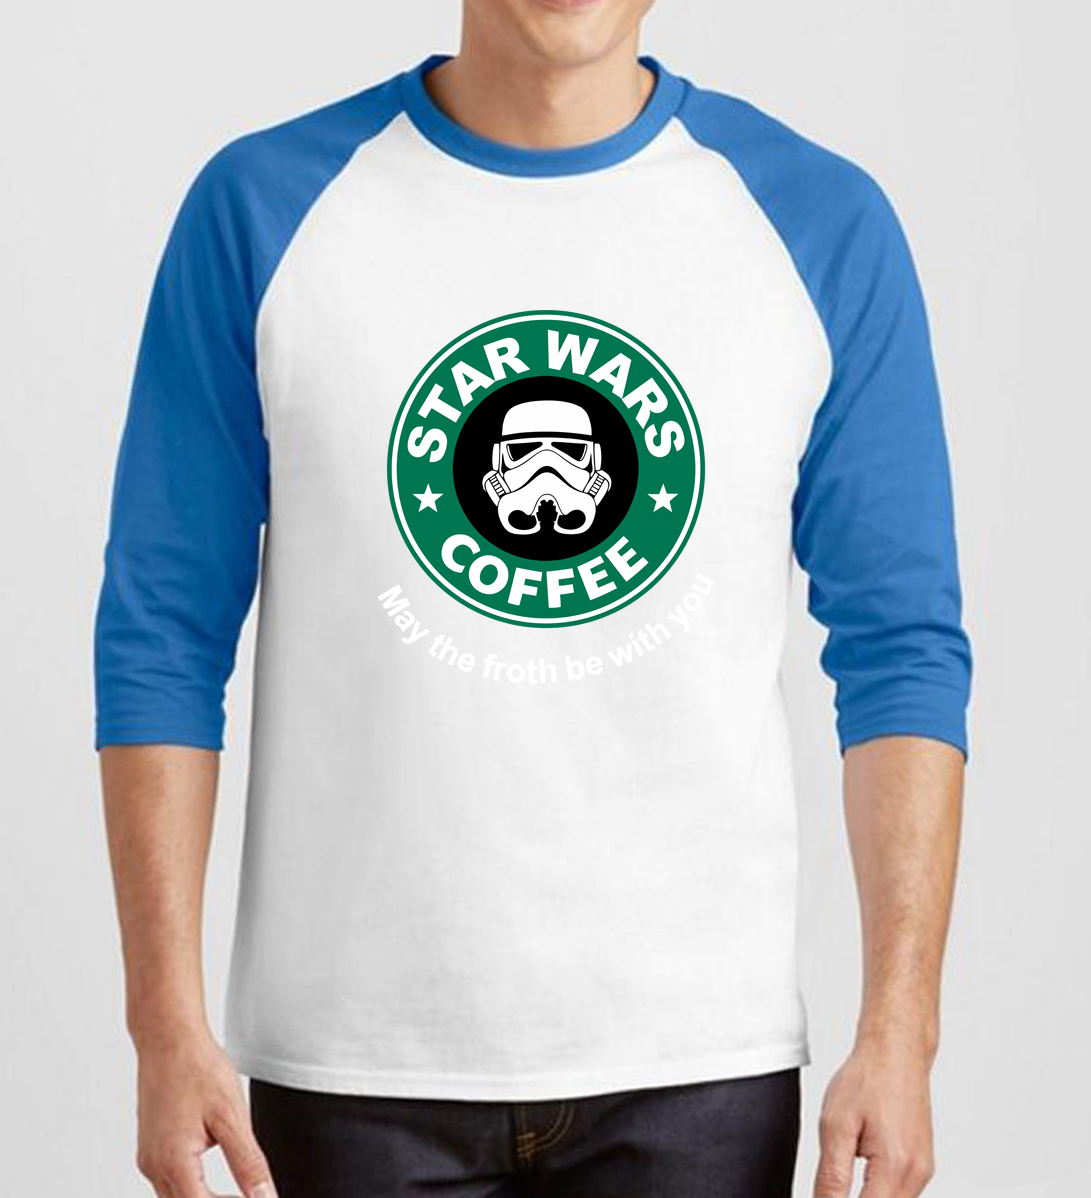 2019 star wars fitness three-quarter sleeve tee shirt homme Hip-hop  men's T-shirts fashion man cotton raglan brand clothing